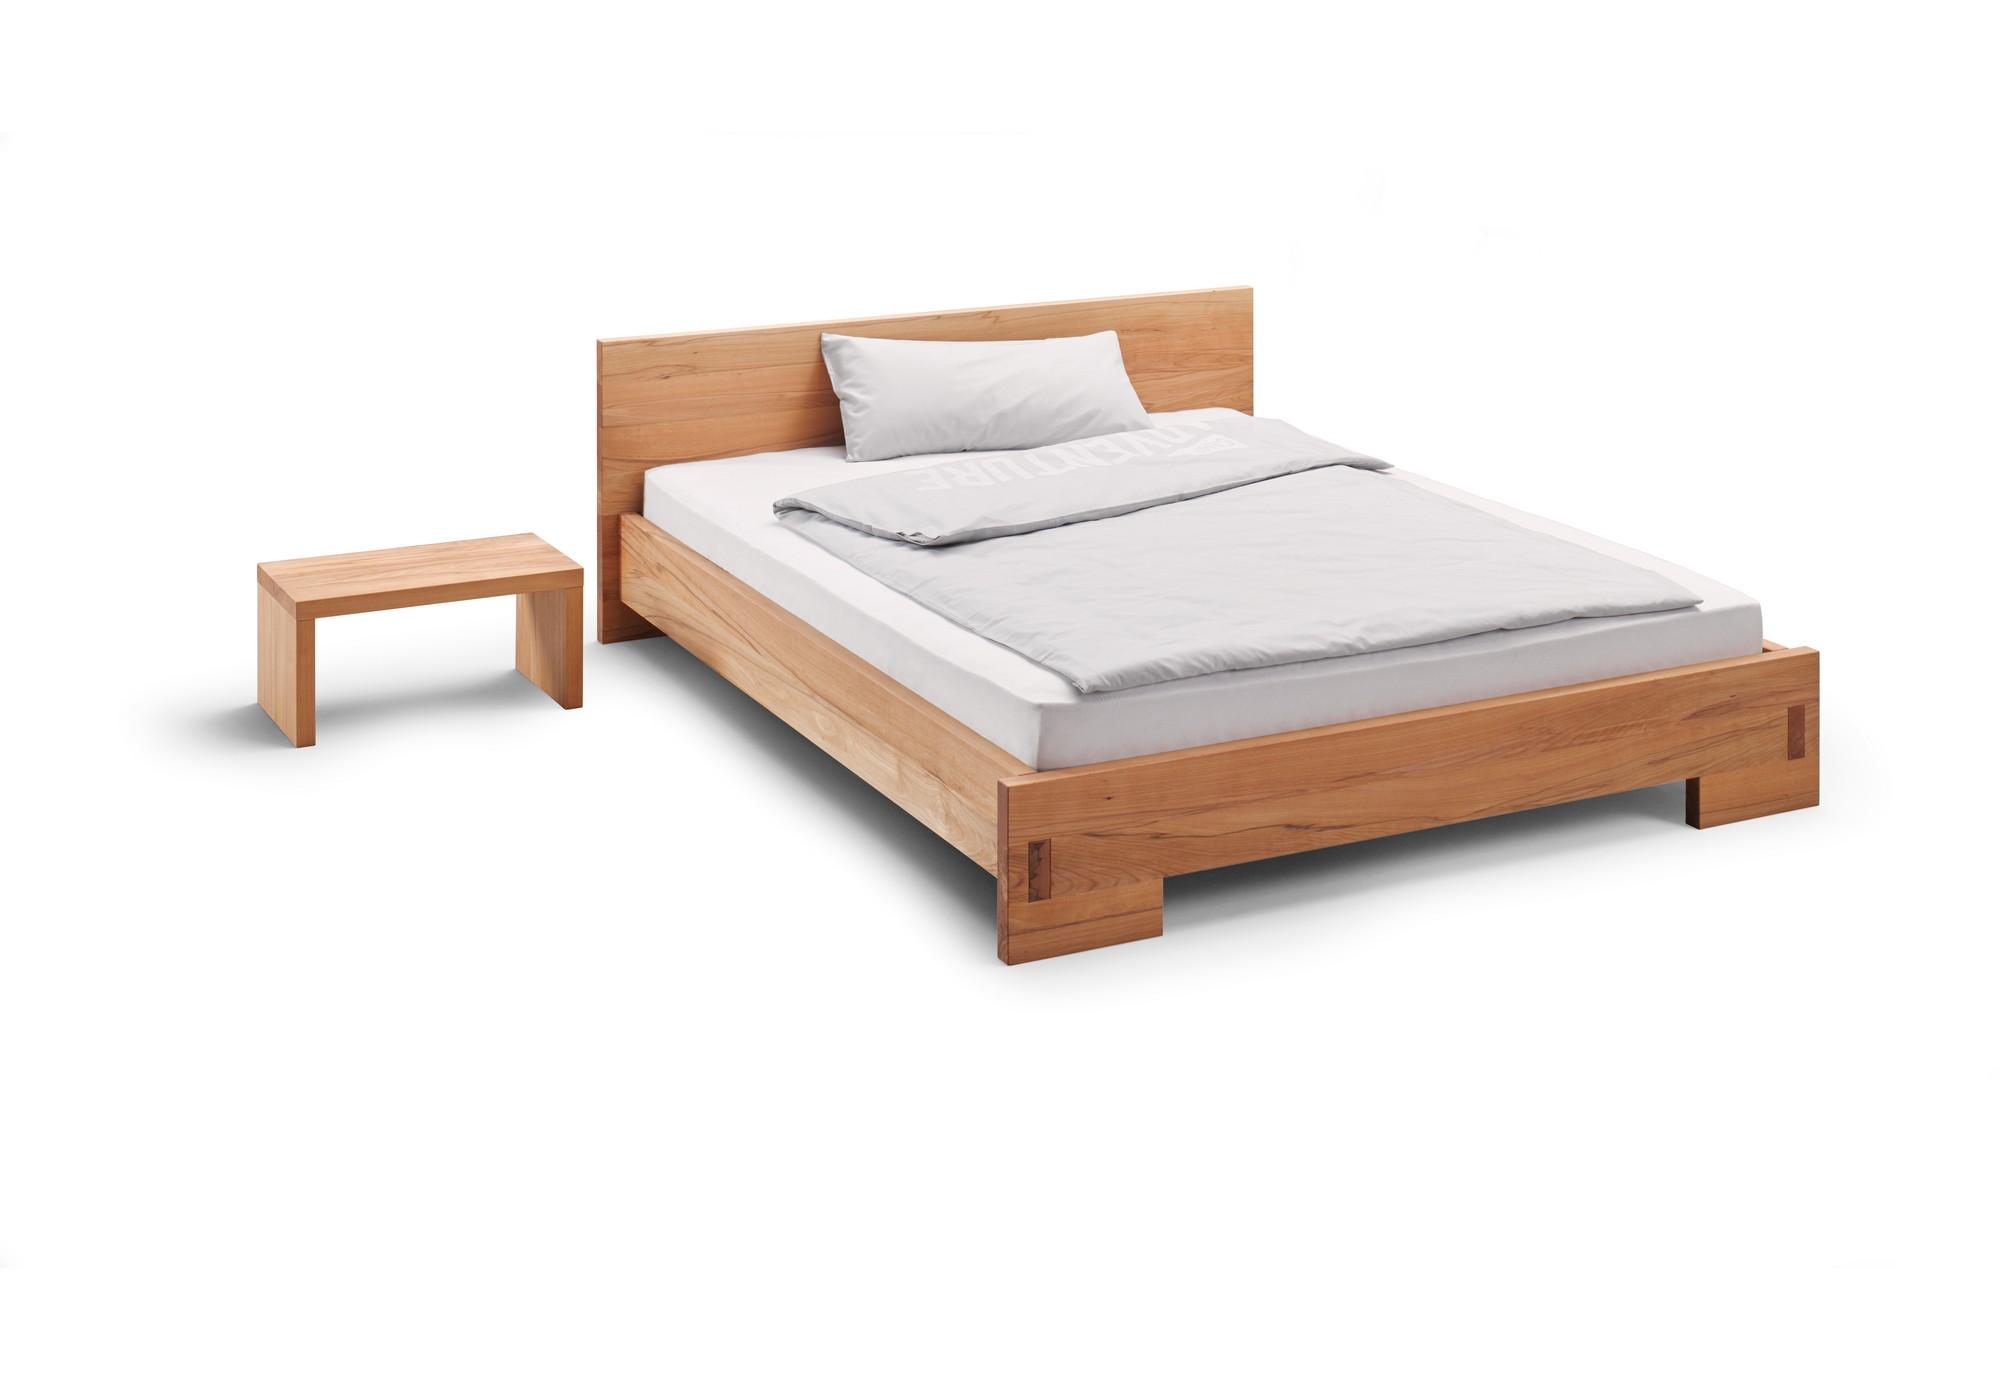 holzmanufaktur massivholzbett zen 10 betten kraft. Black Bedroom Furniture Sets. Home Design Ideas